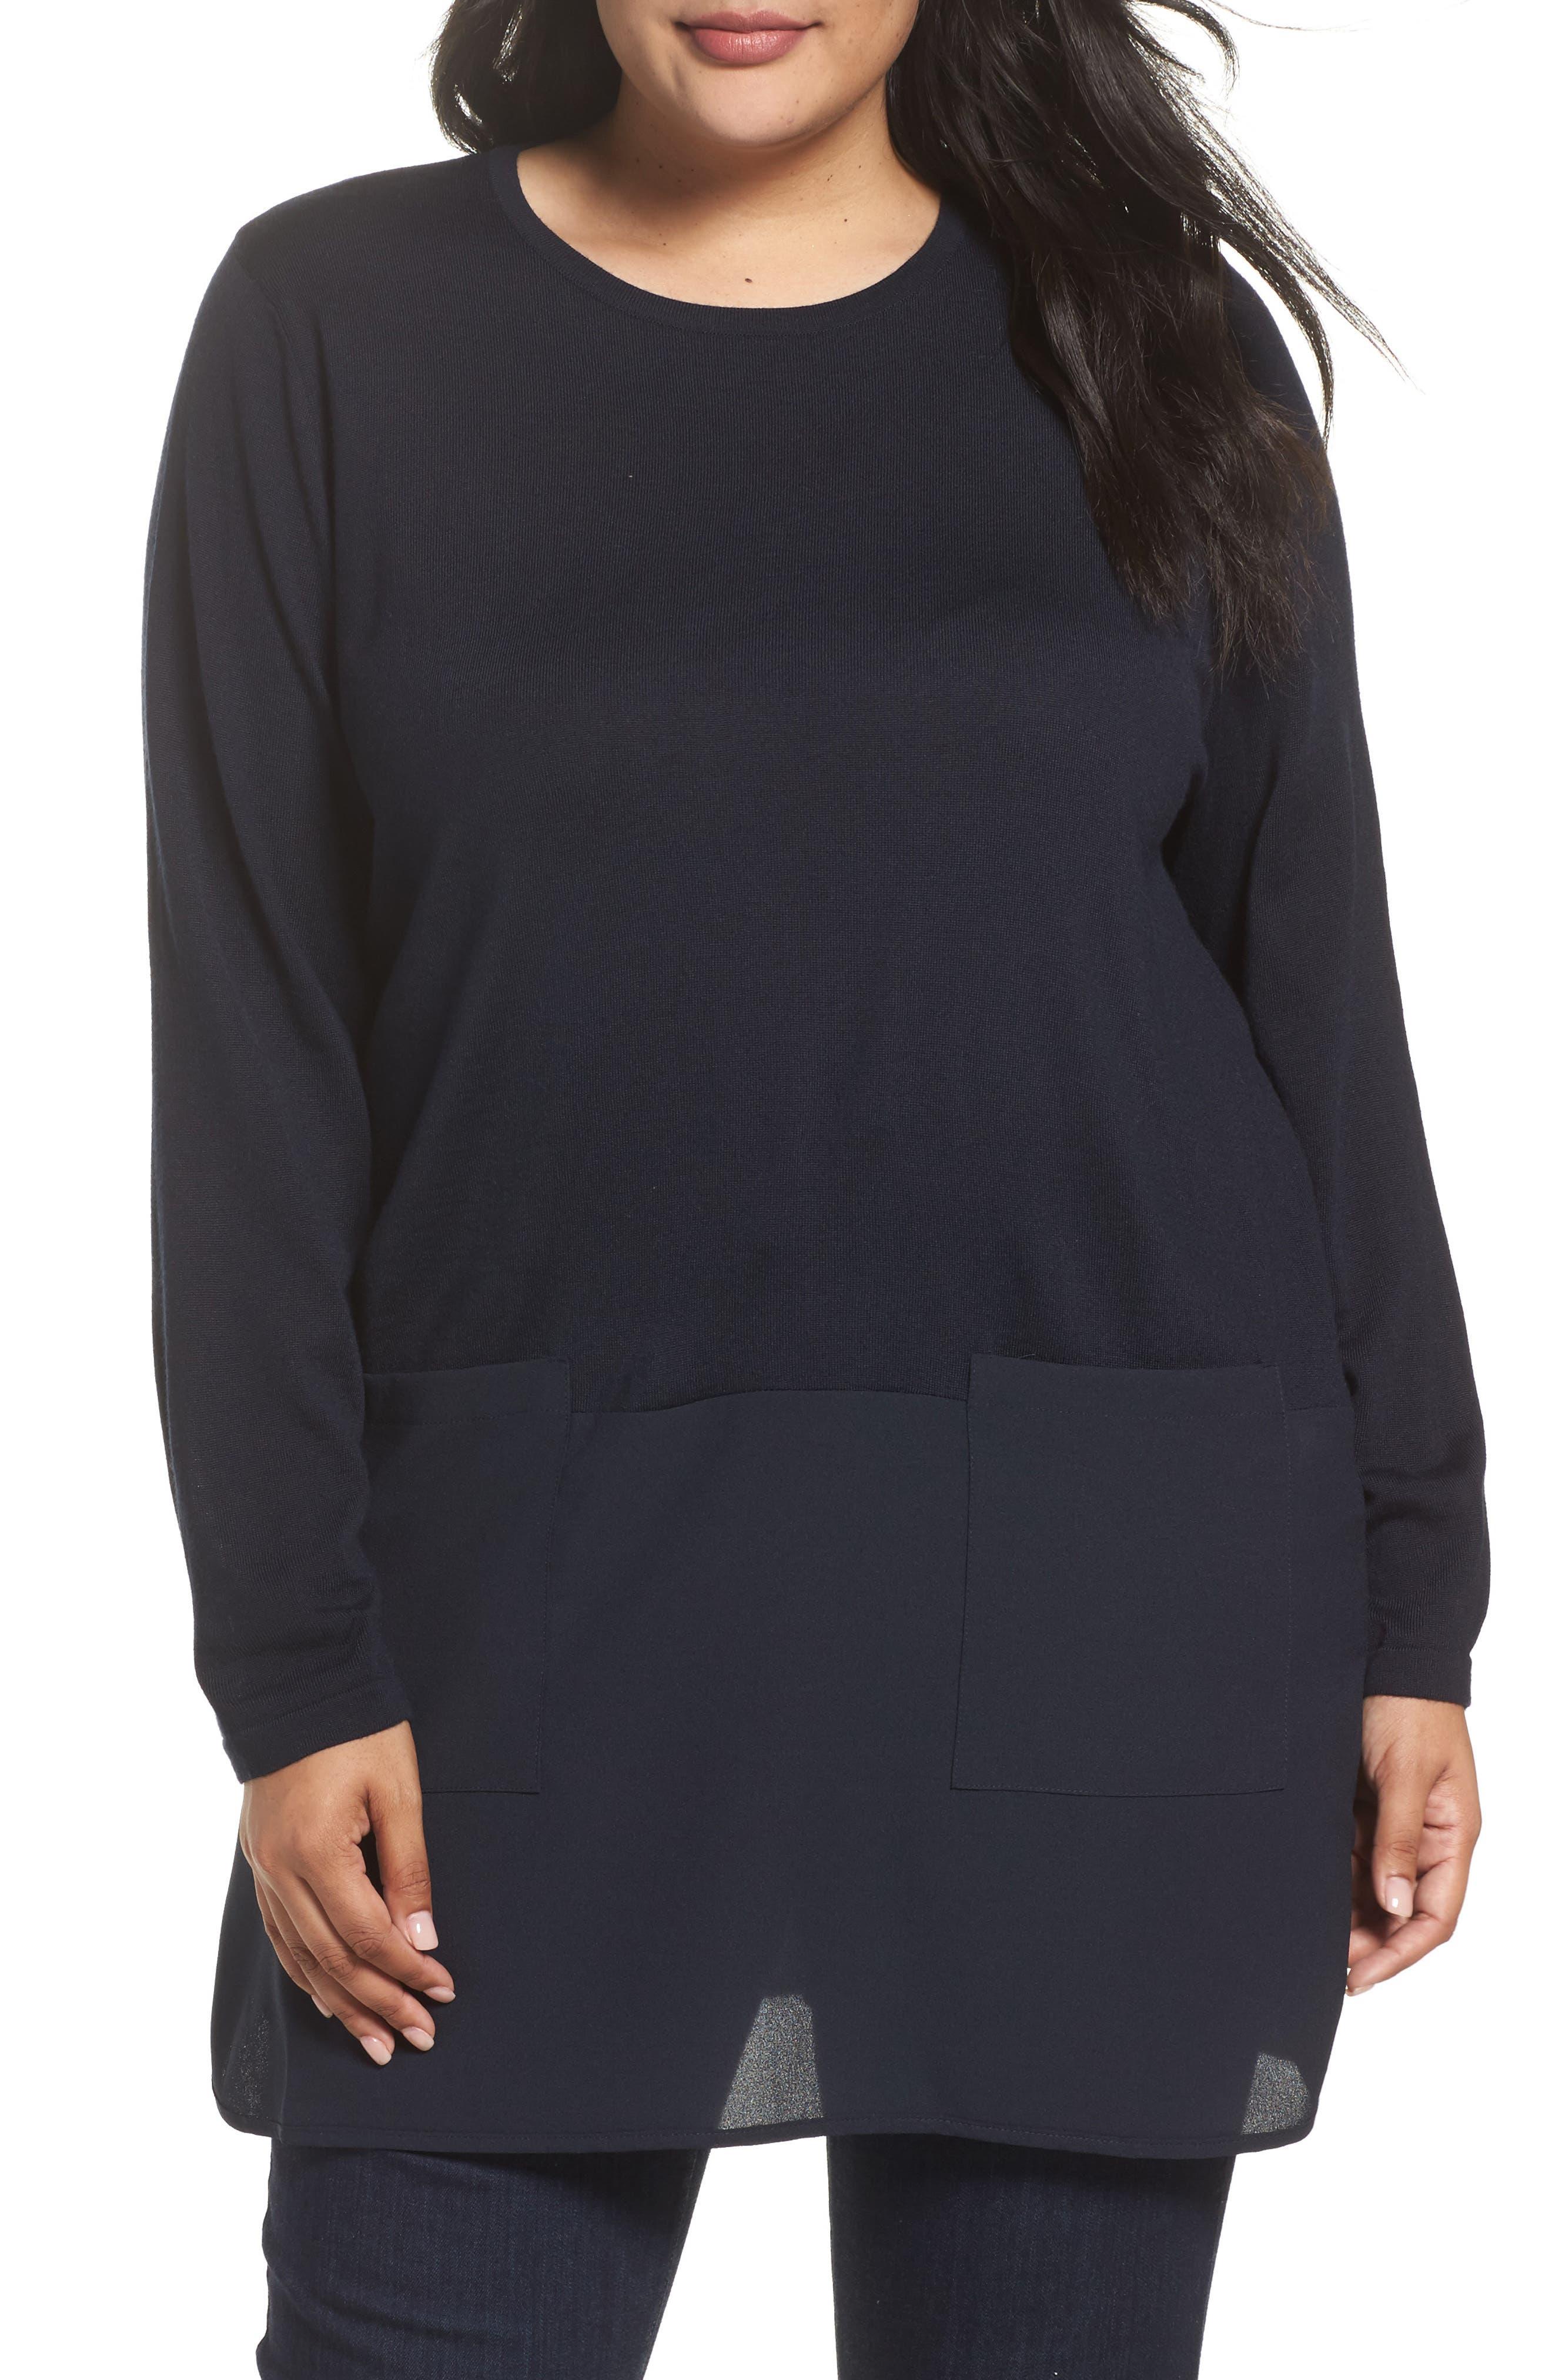 Main Image - Persona by Marina Rinaldi Adamo MIxed Media Sweater (Plus Size)